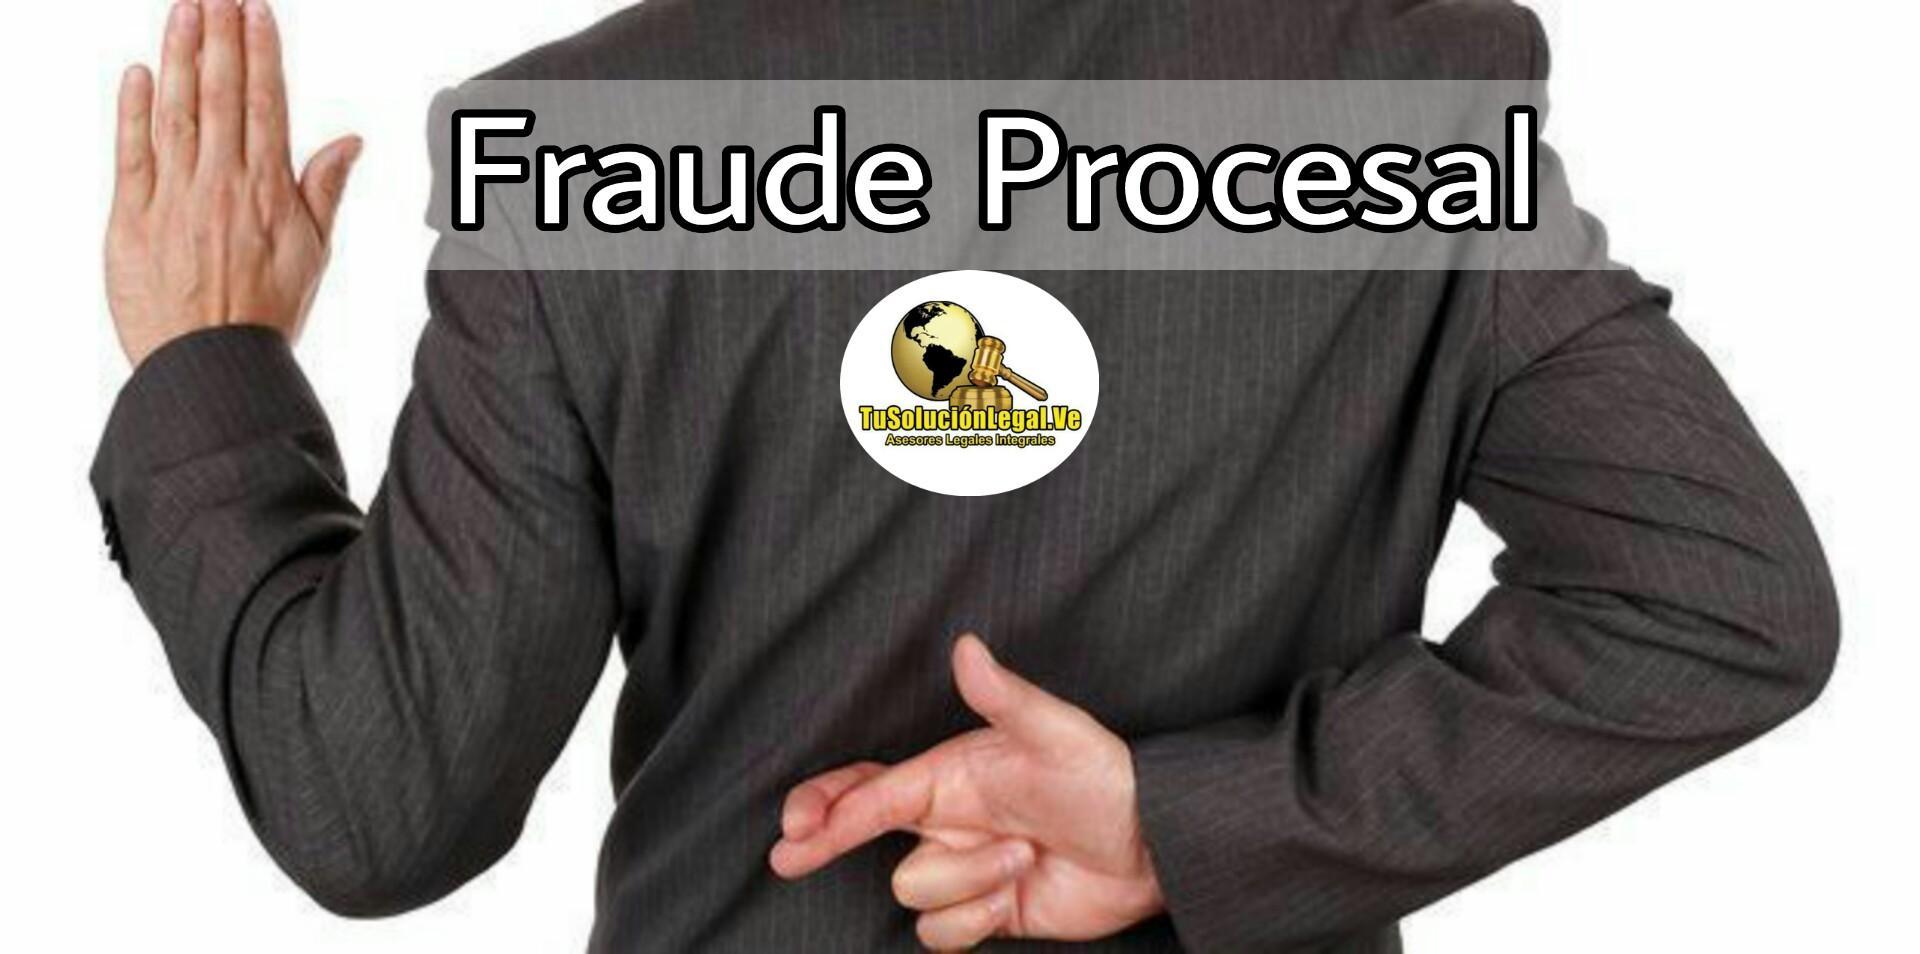 Juicio Simulado O Fraude Procesal, estafa, abogados venzuela, tusolucionlegal.com.ve, juicio aparente, juicio inesxistente, justicia falsa,;